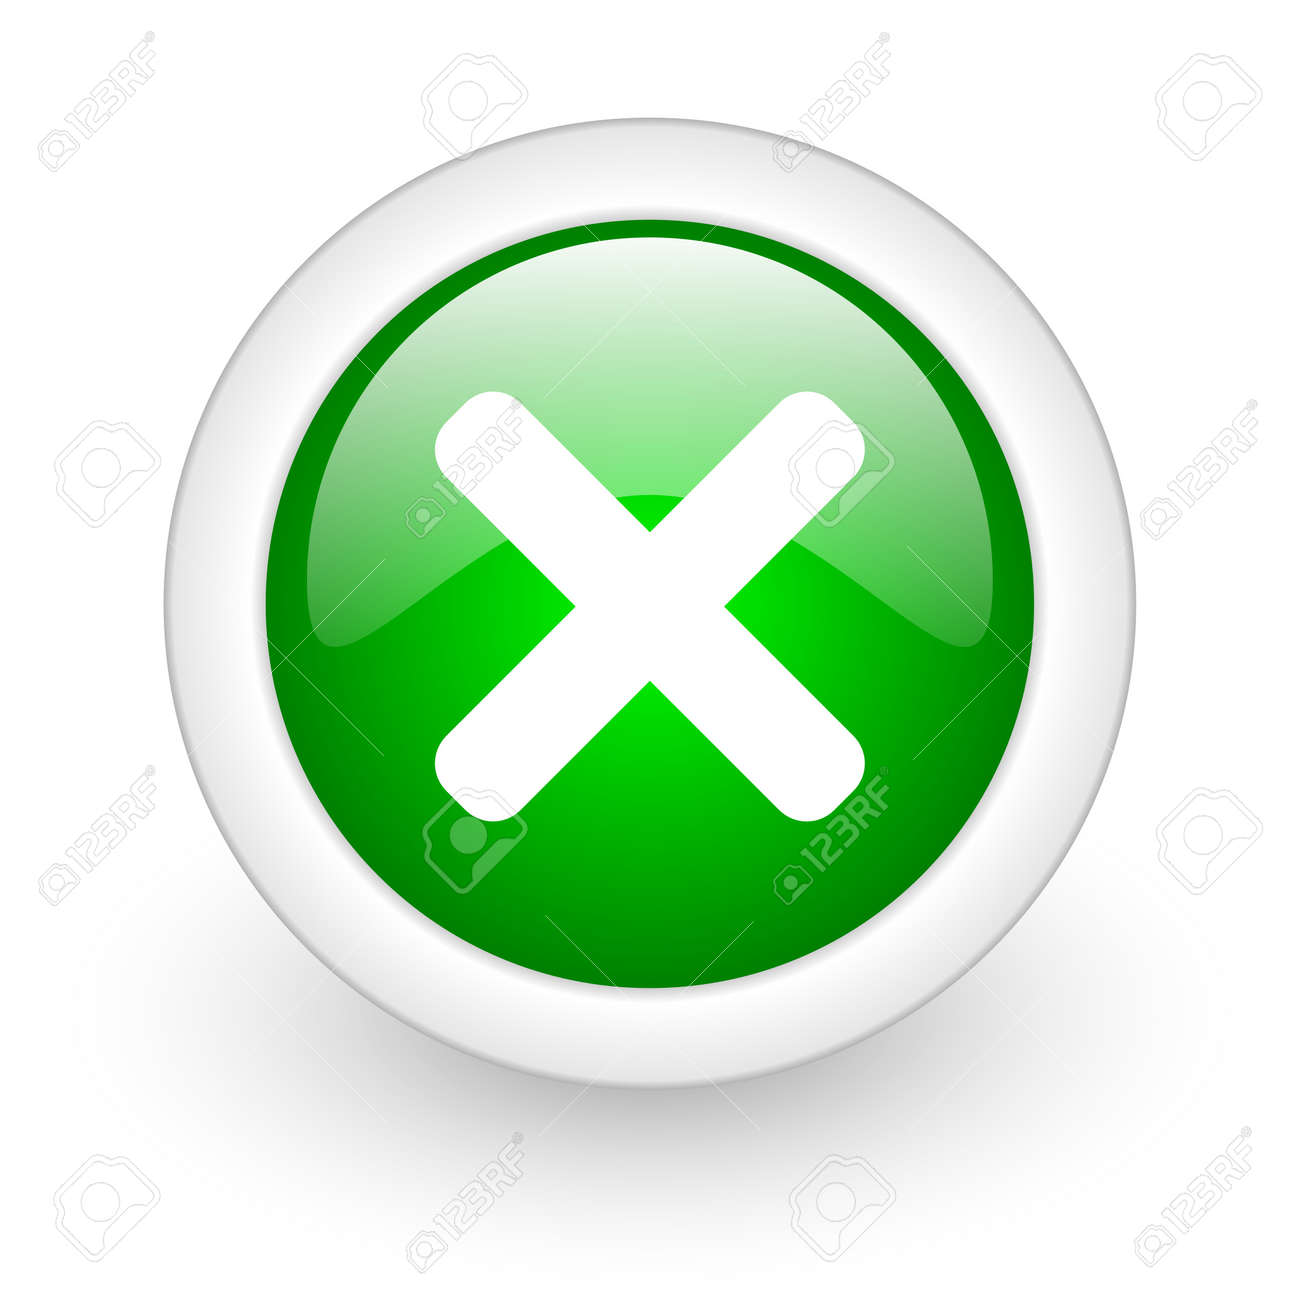 cancel green circle glossy web icon on white background Stock Photo - 17864830